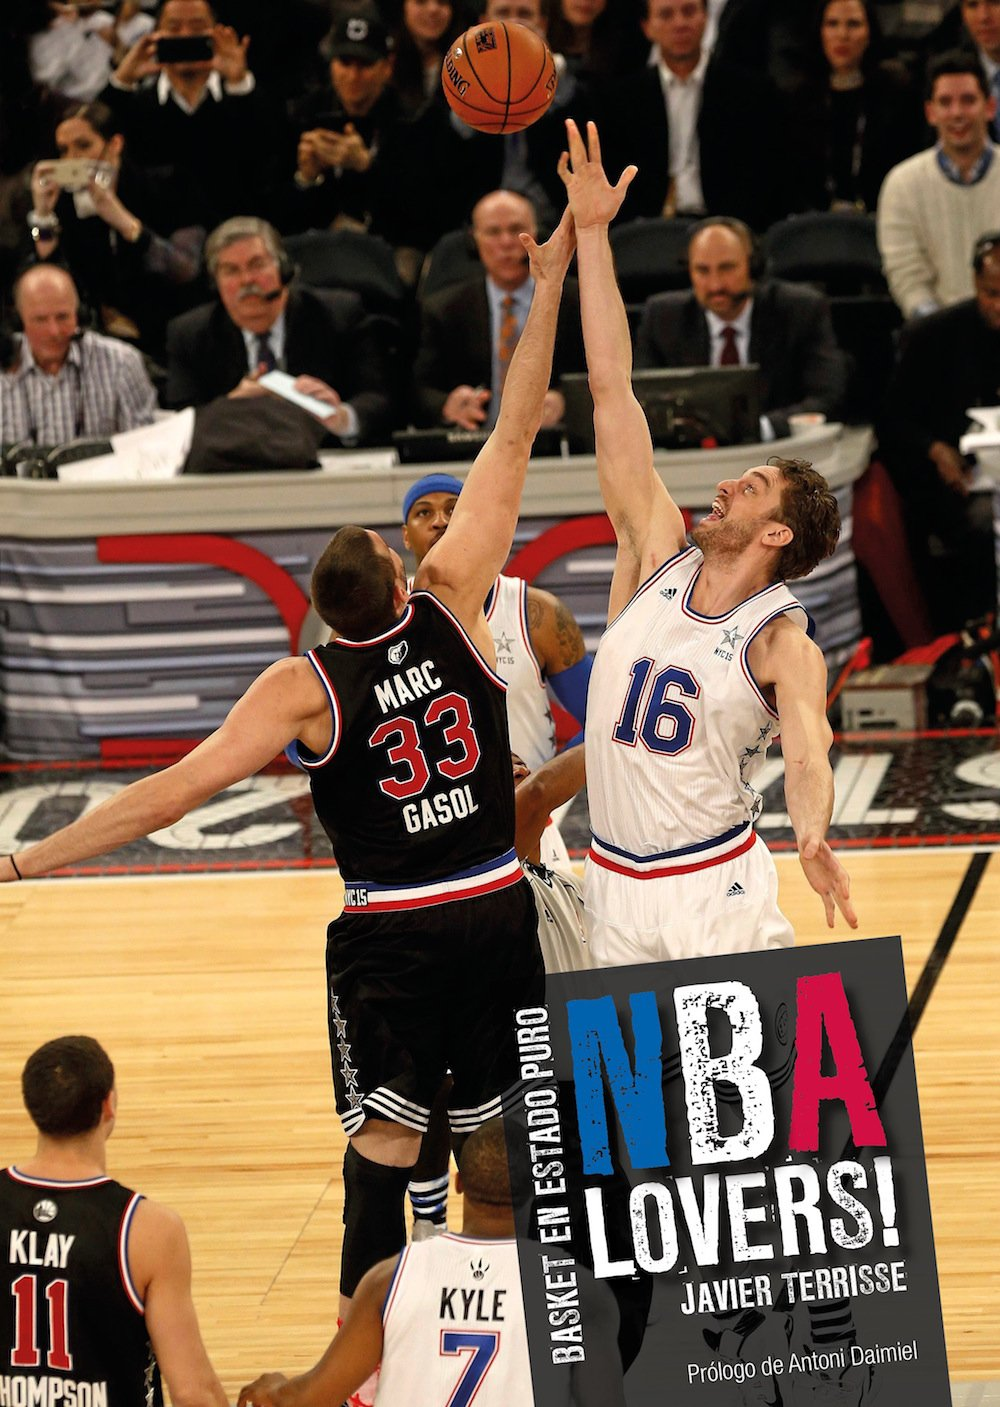 NBA Lovers Tapa dura – 19 may 2016 Javier Terrisse Córner 849441836X Basketball - General